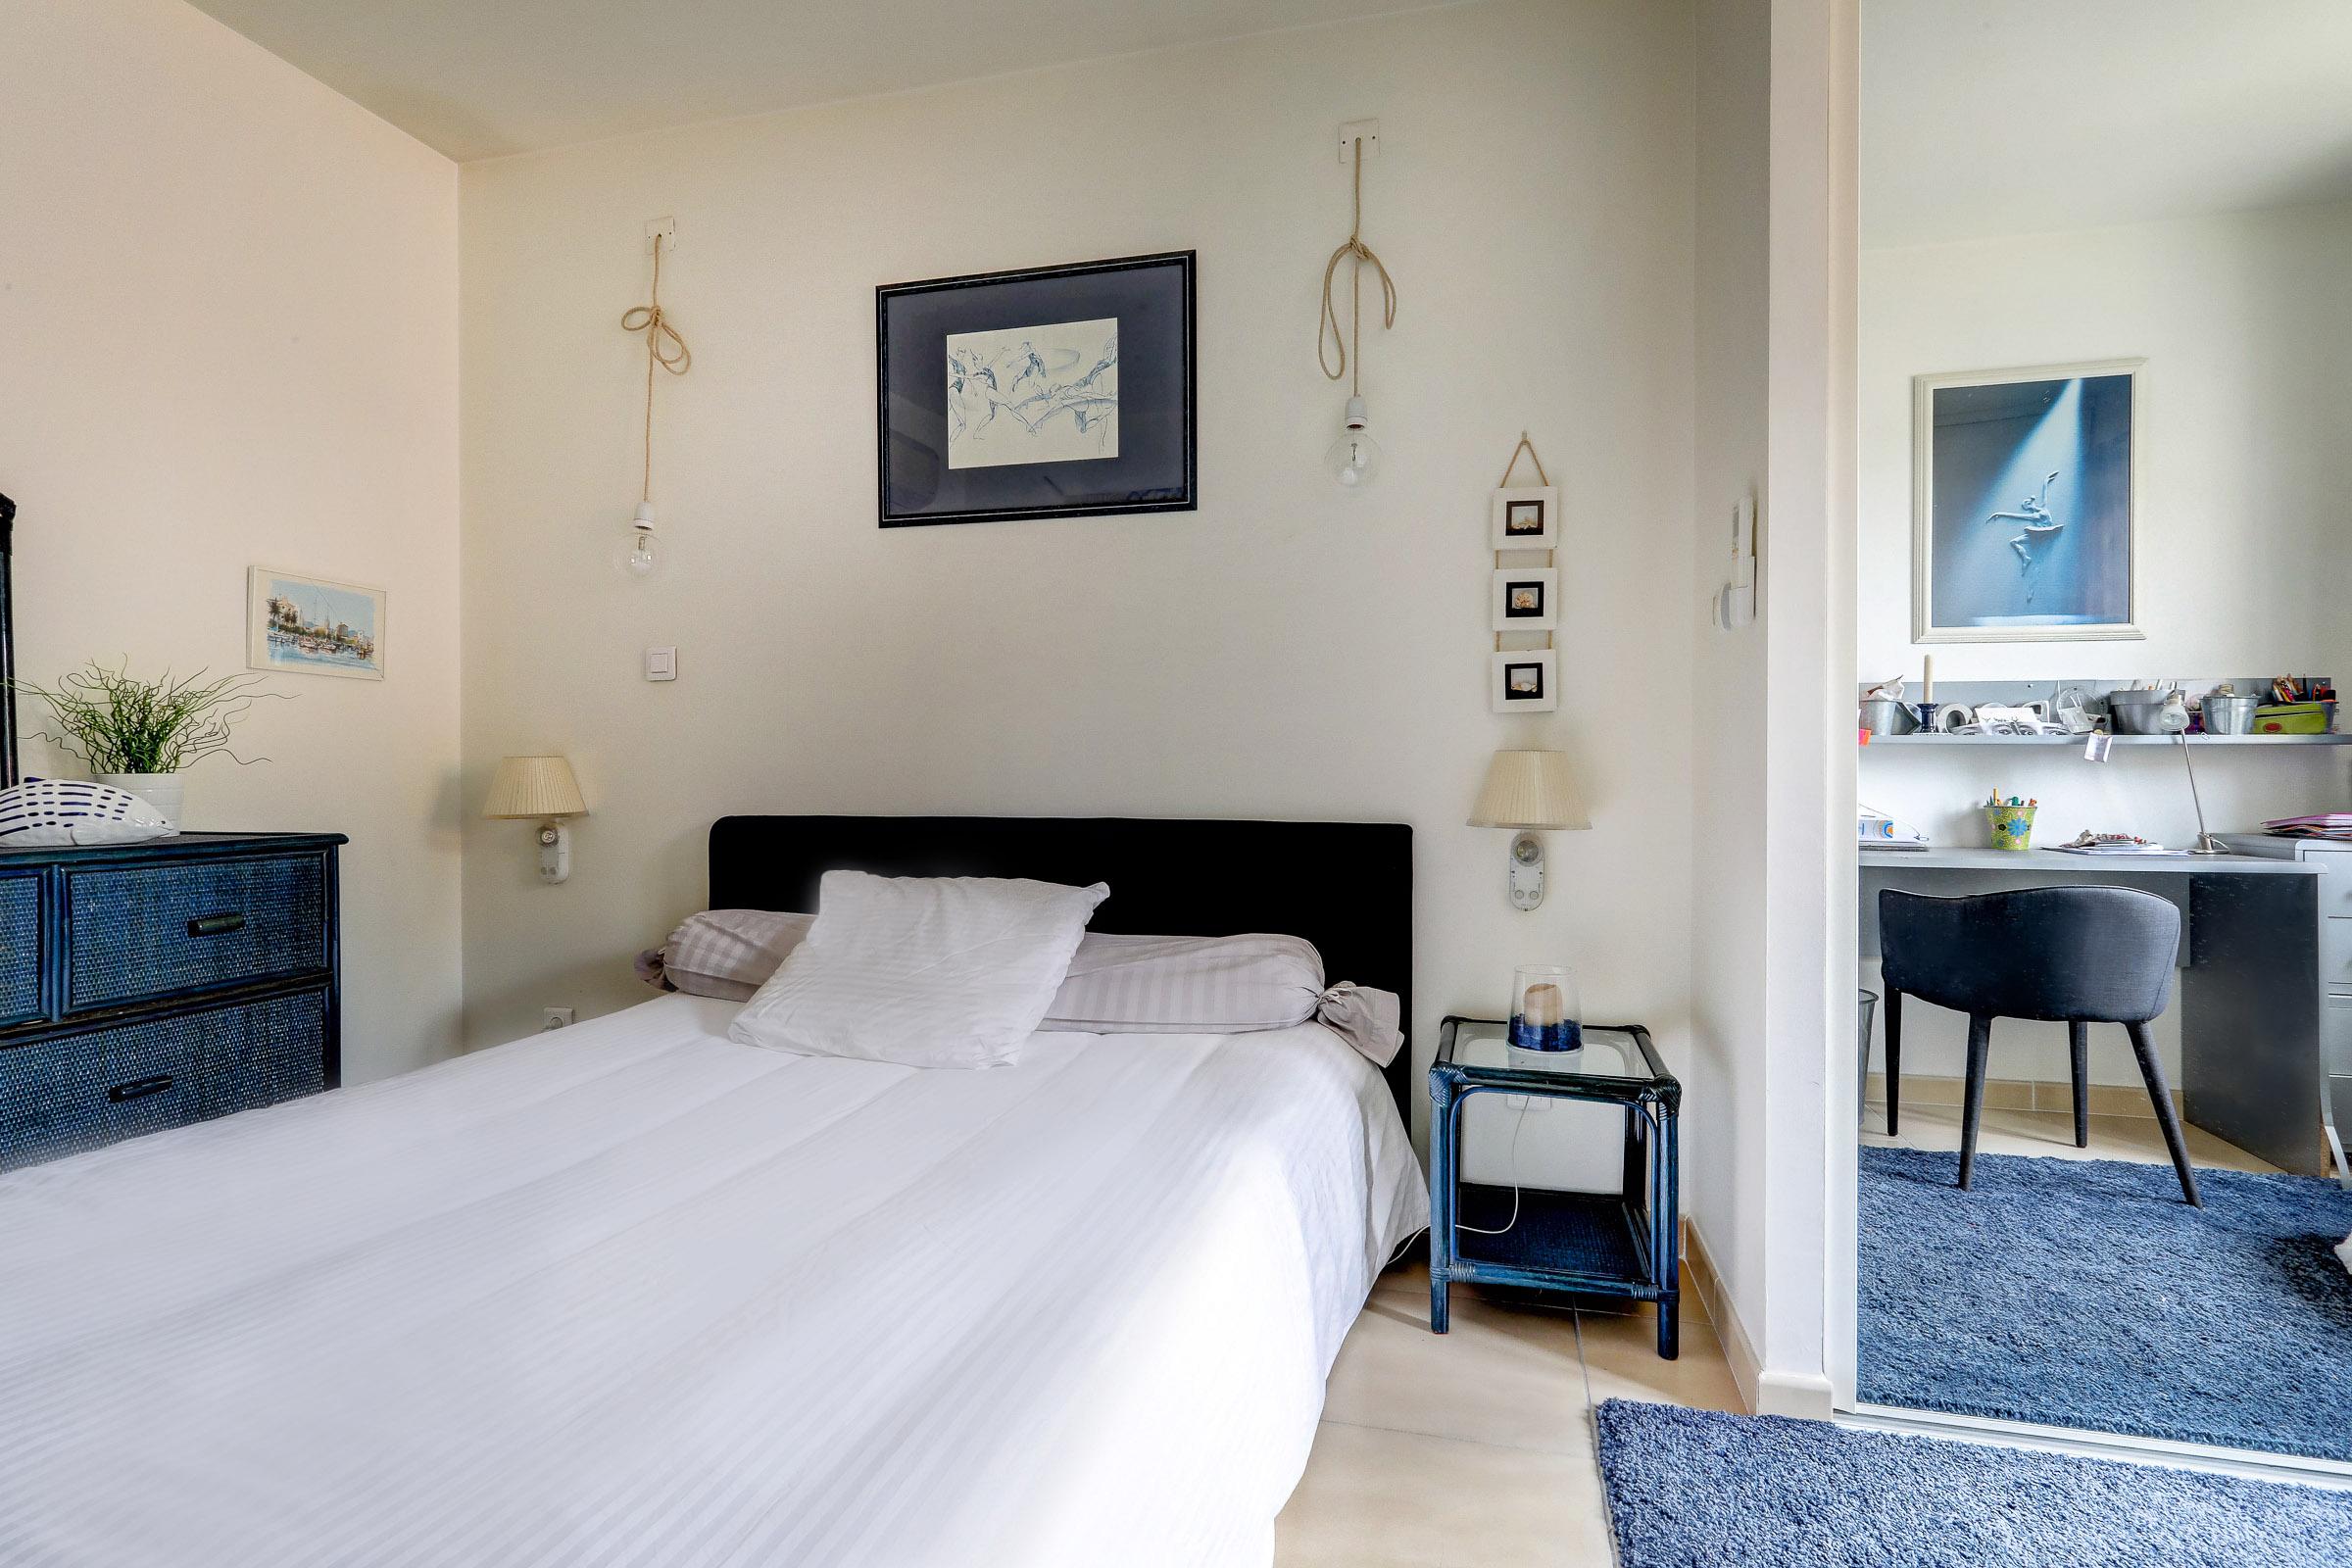 beaumont_13012_villapiscine_teck_contemporaine_terrasse_chambre2_saintjulien_saintbarnabe